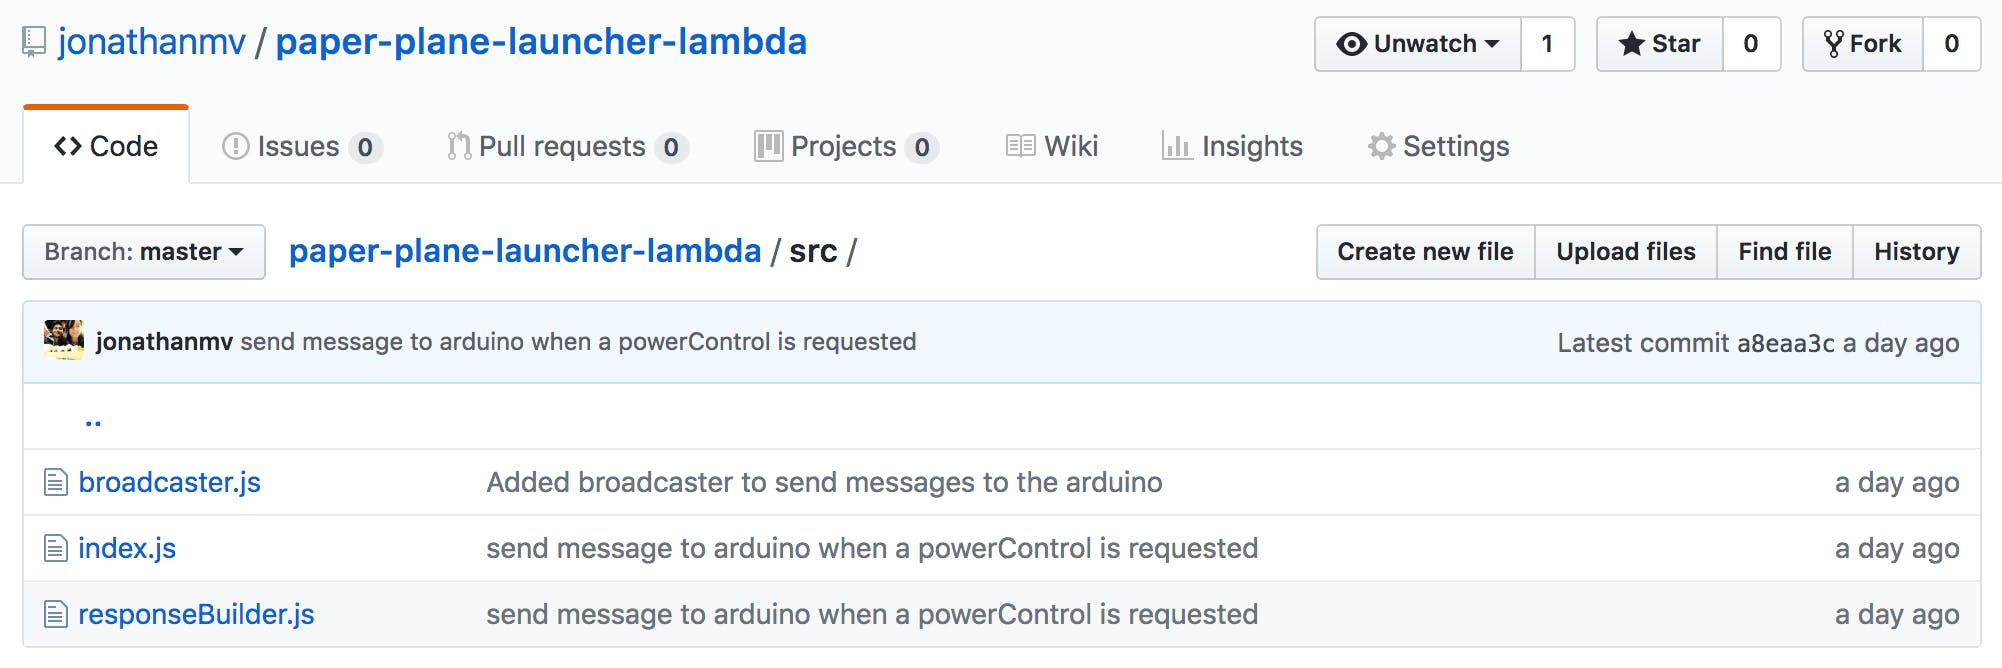 Just three files compose the lambda